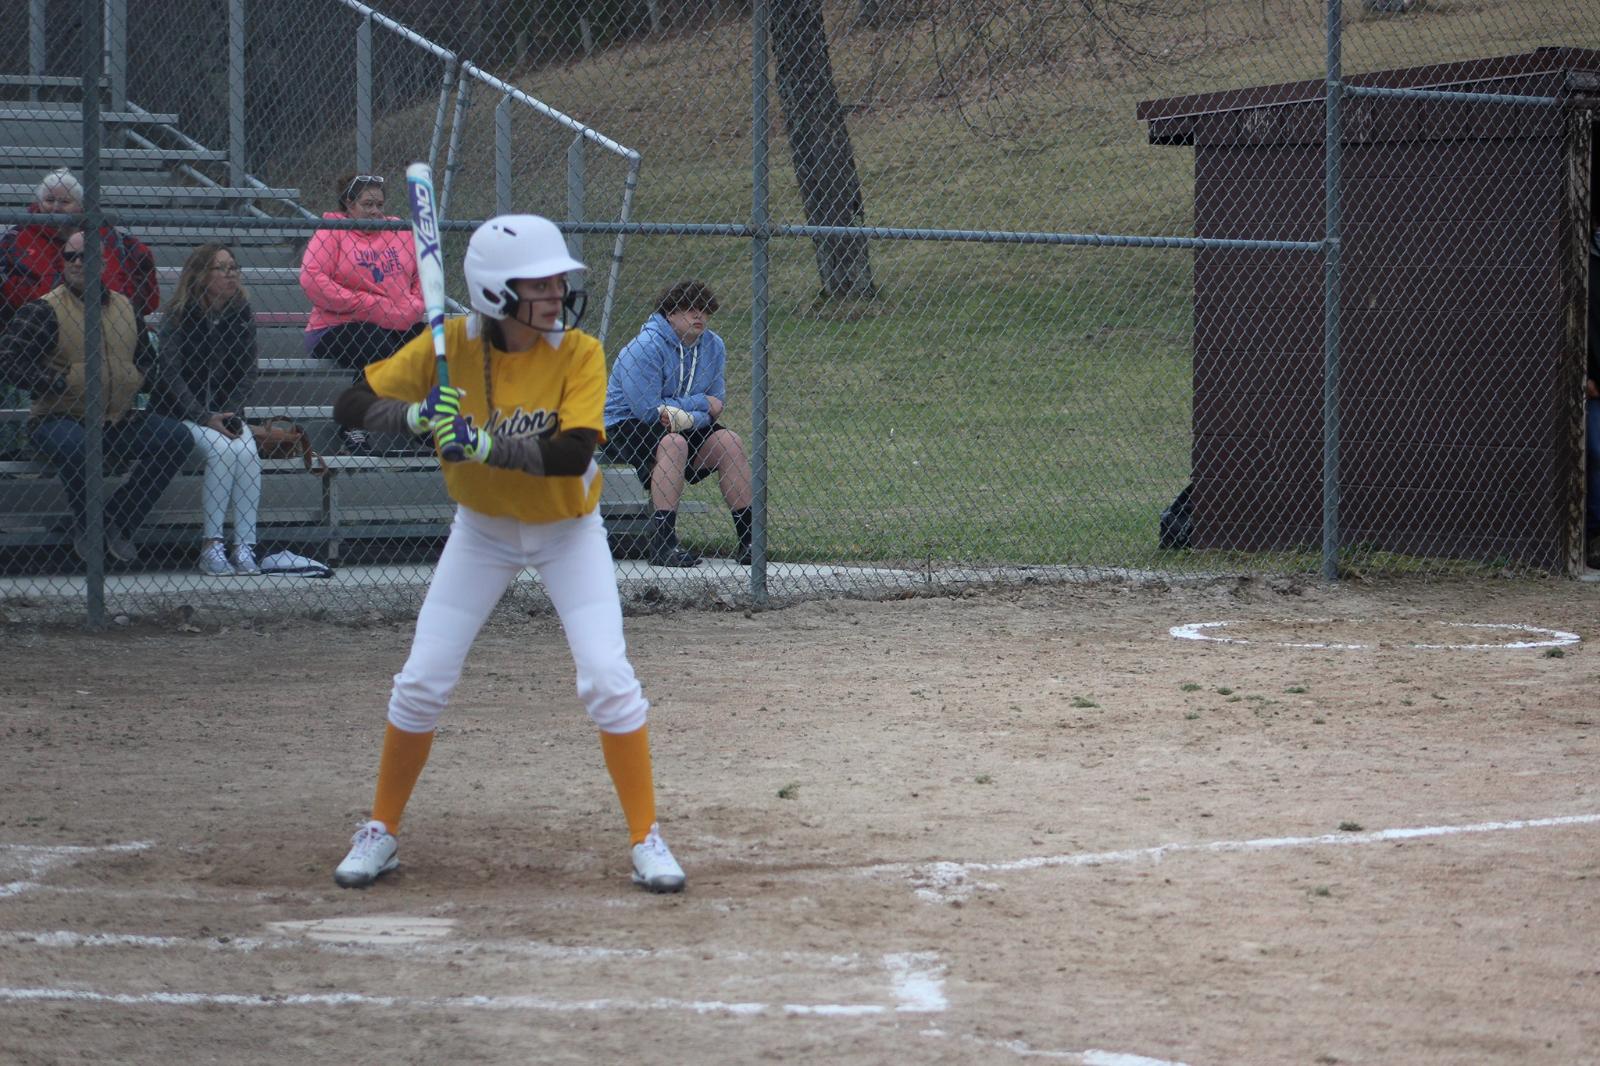 PHOTOS: Softball vs Ellsworth 4/9/21